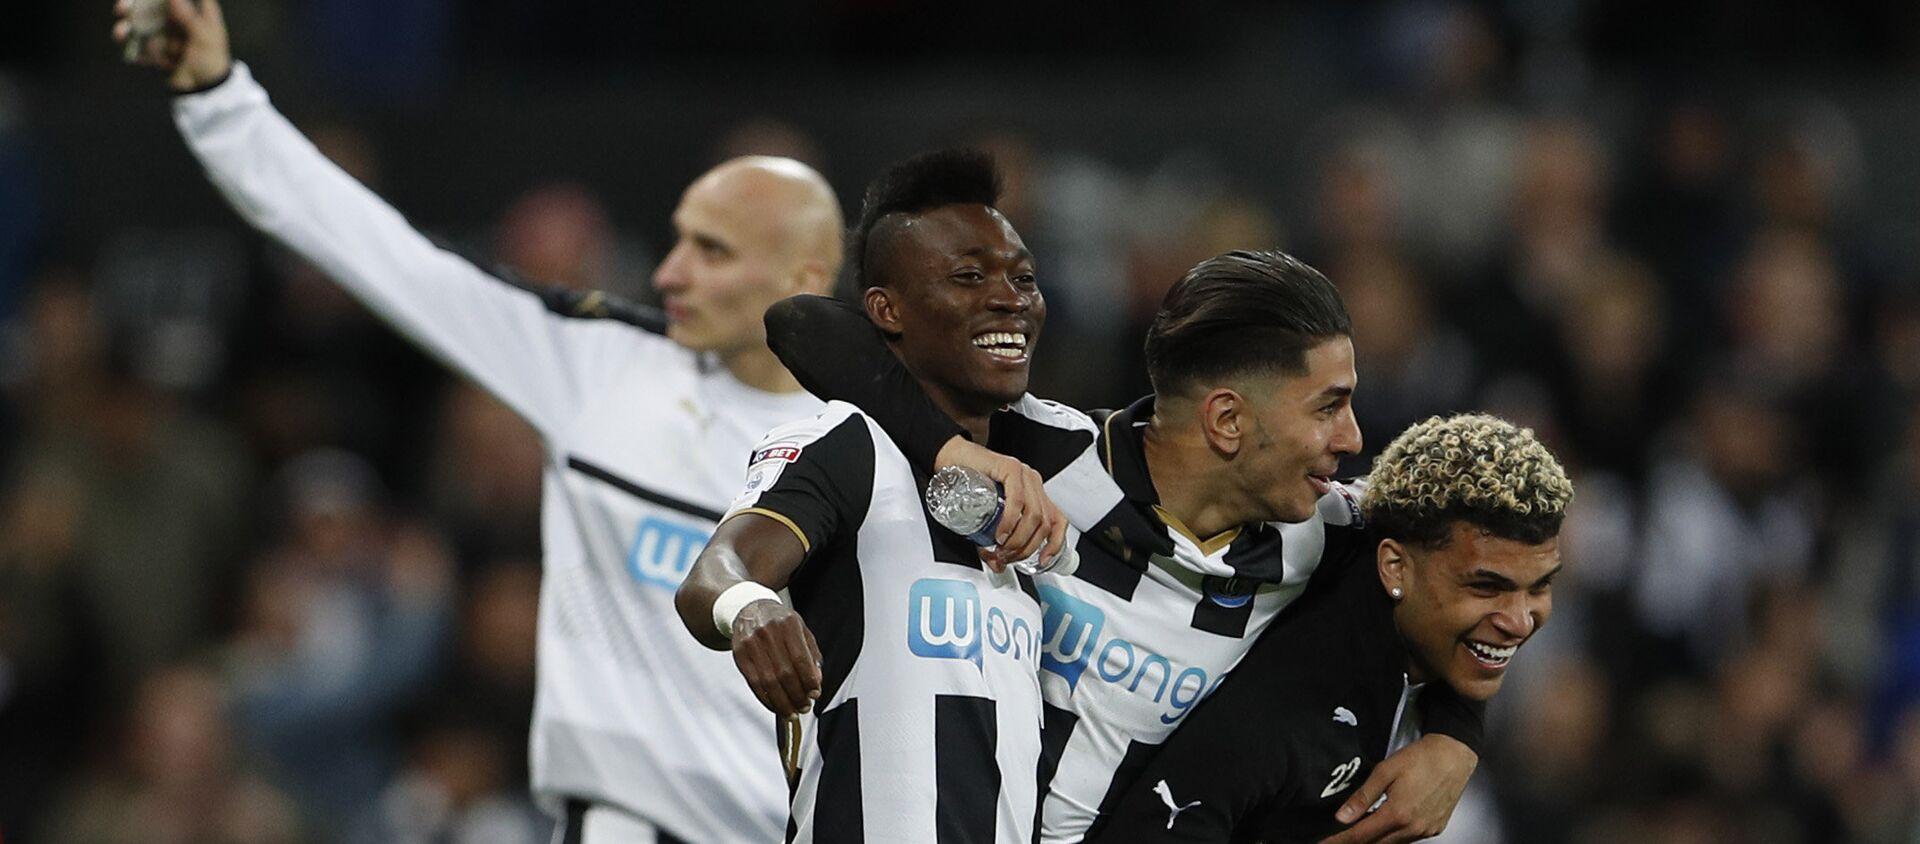 Newcastle United - Sputnik Türkiye, 1920, 24.04.2017